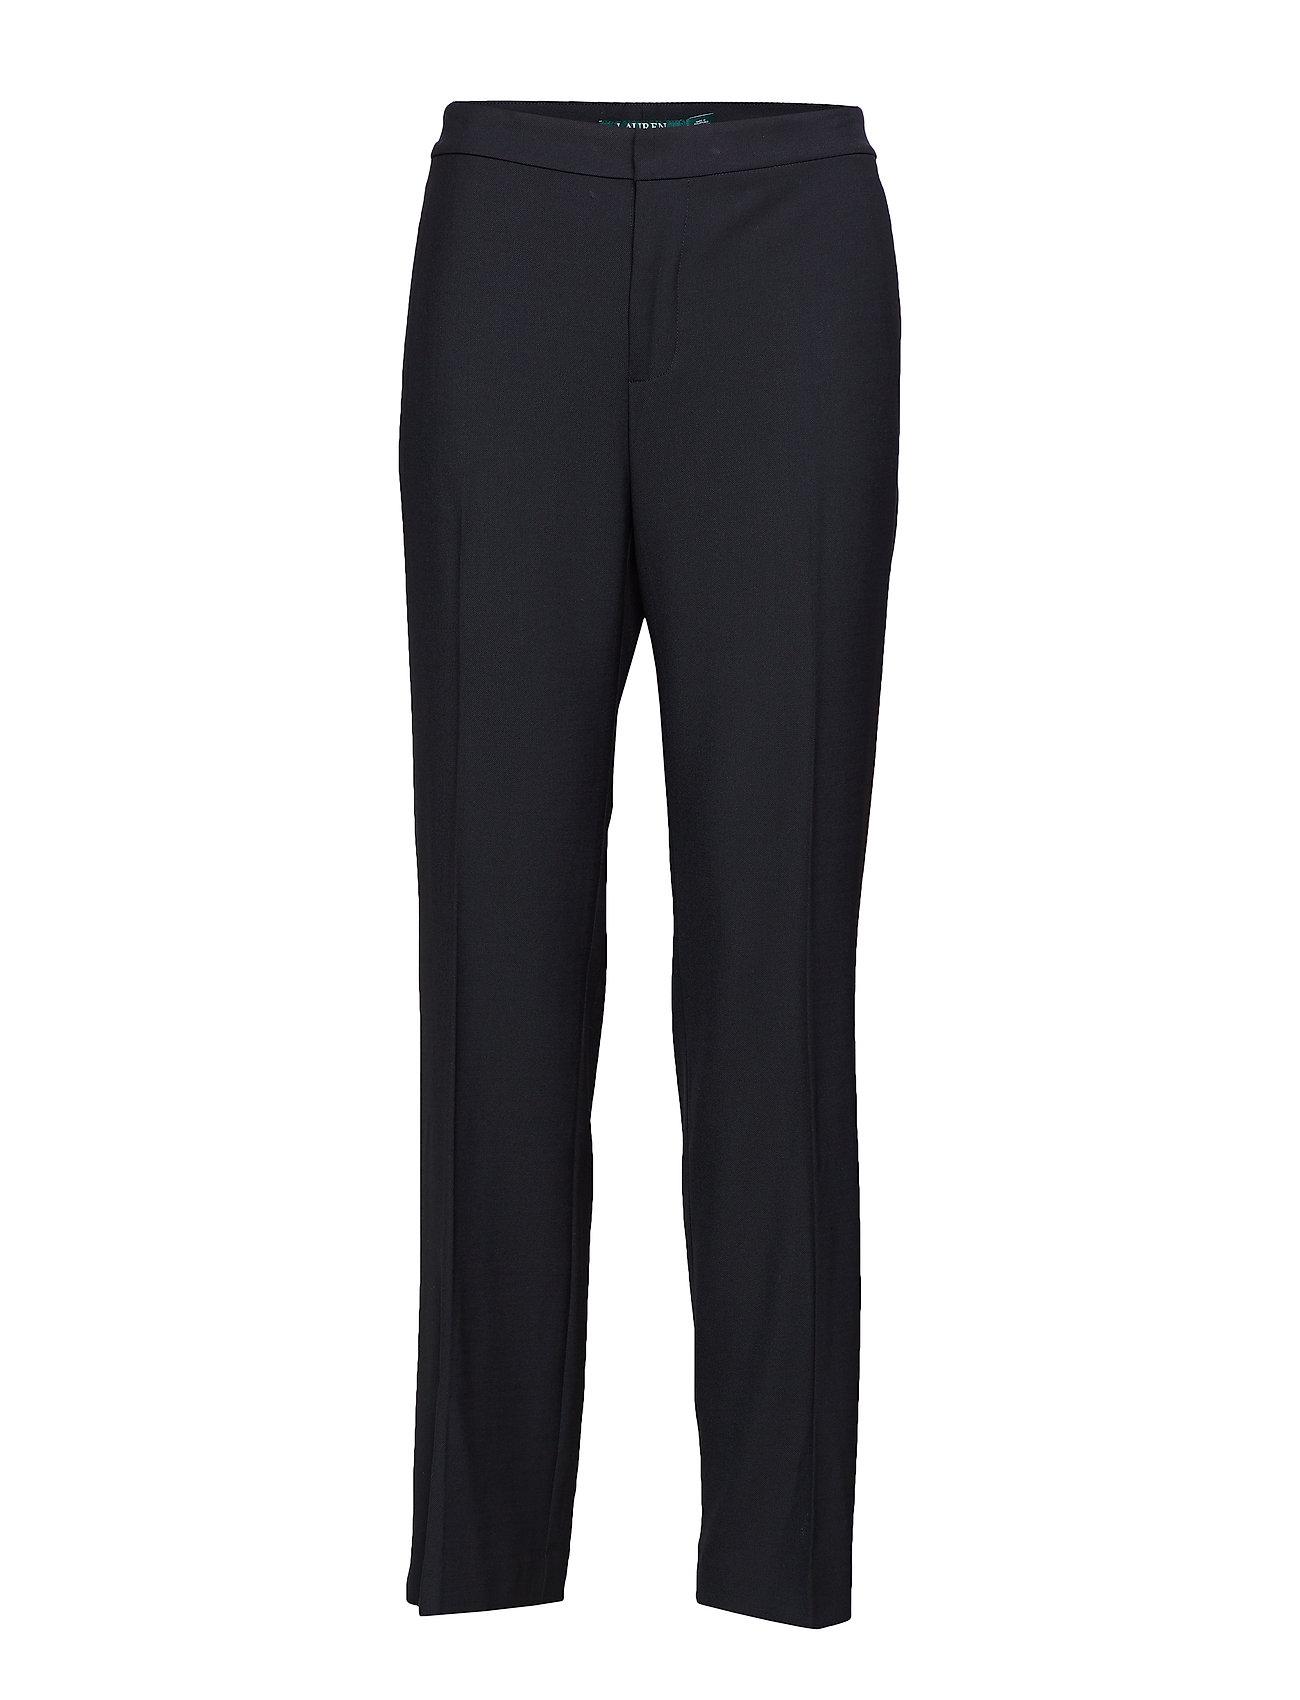 66cbc7b4f27 Tuxedo-stripe Twill Pant (Polo Black) (£165) - Lauren Ralph Lauren ...